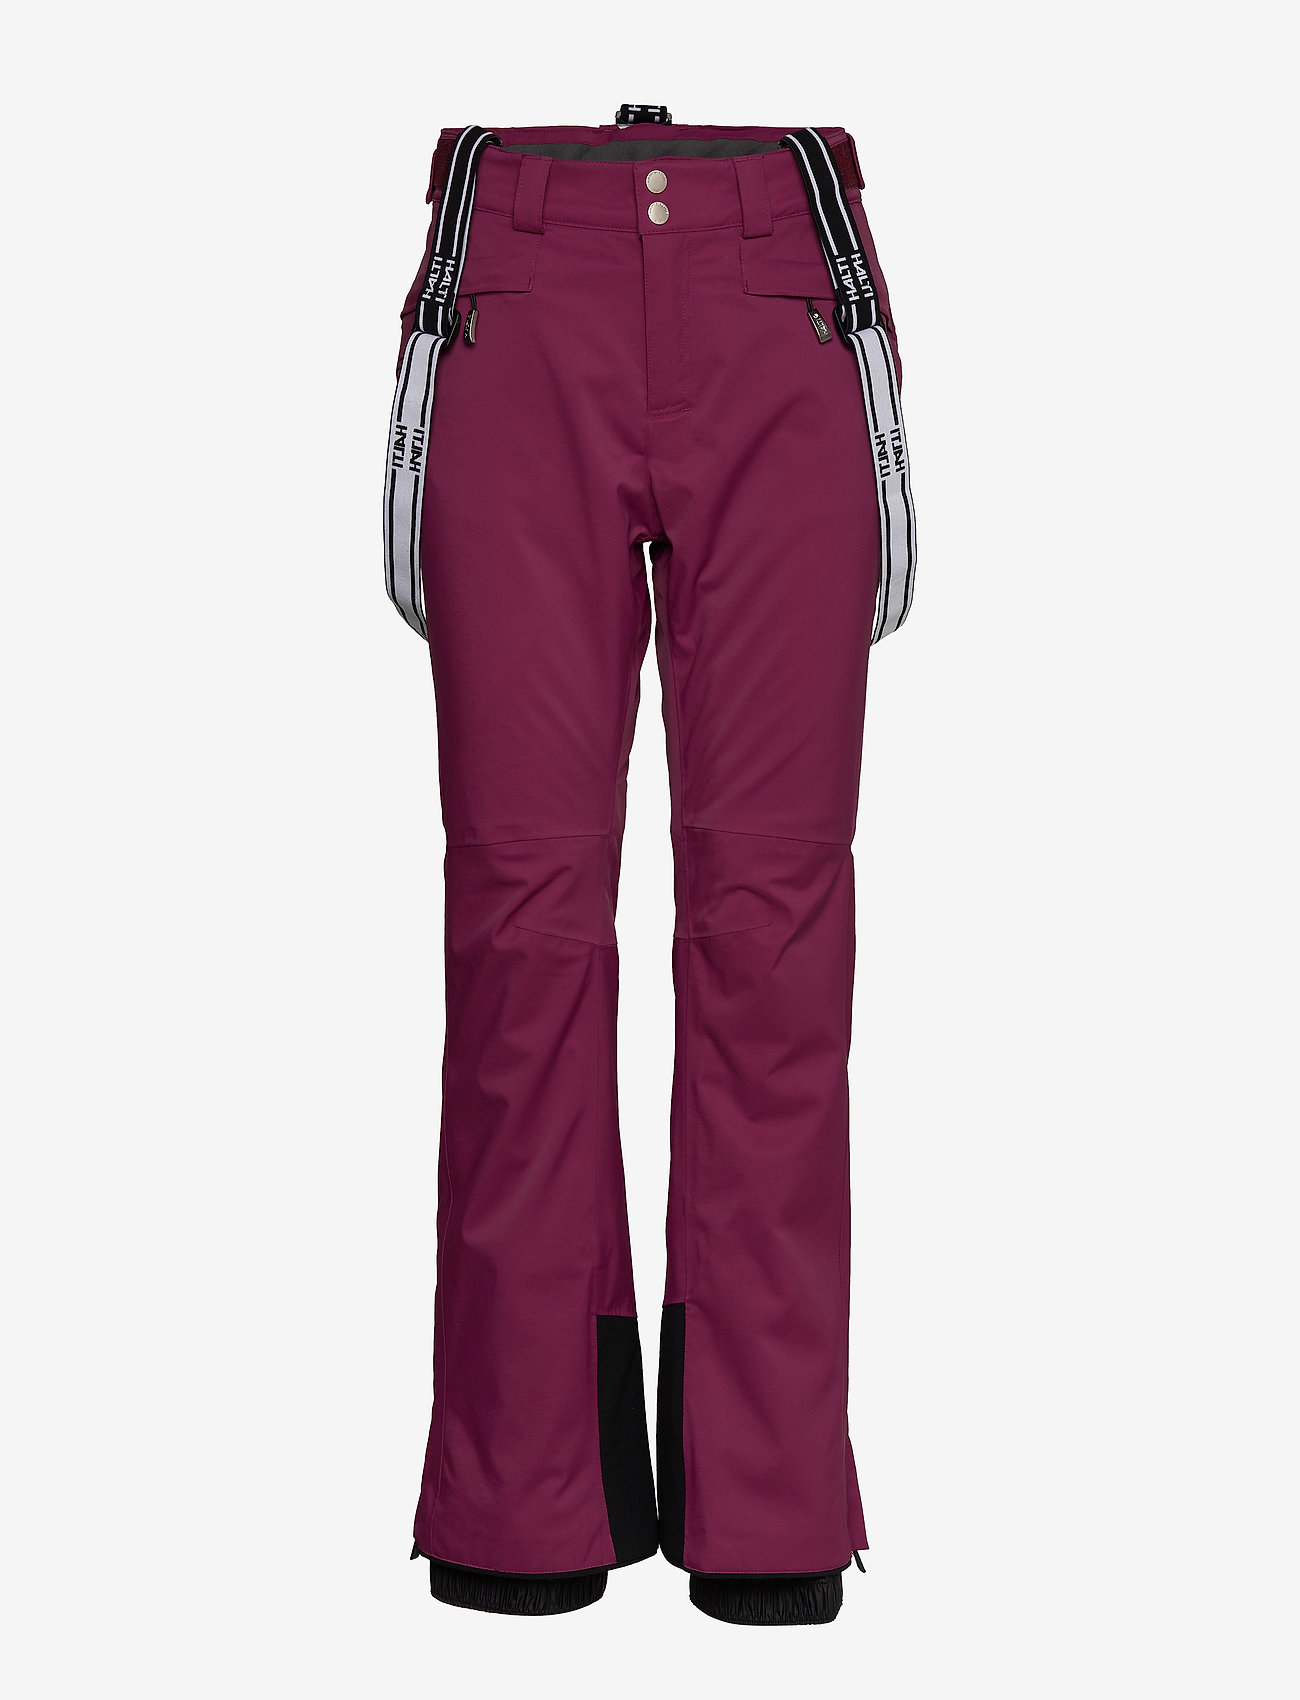 Halti - Podium Women's DX Ski Pants - insulated pants - plum purple - 0